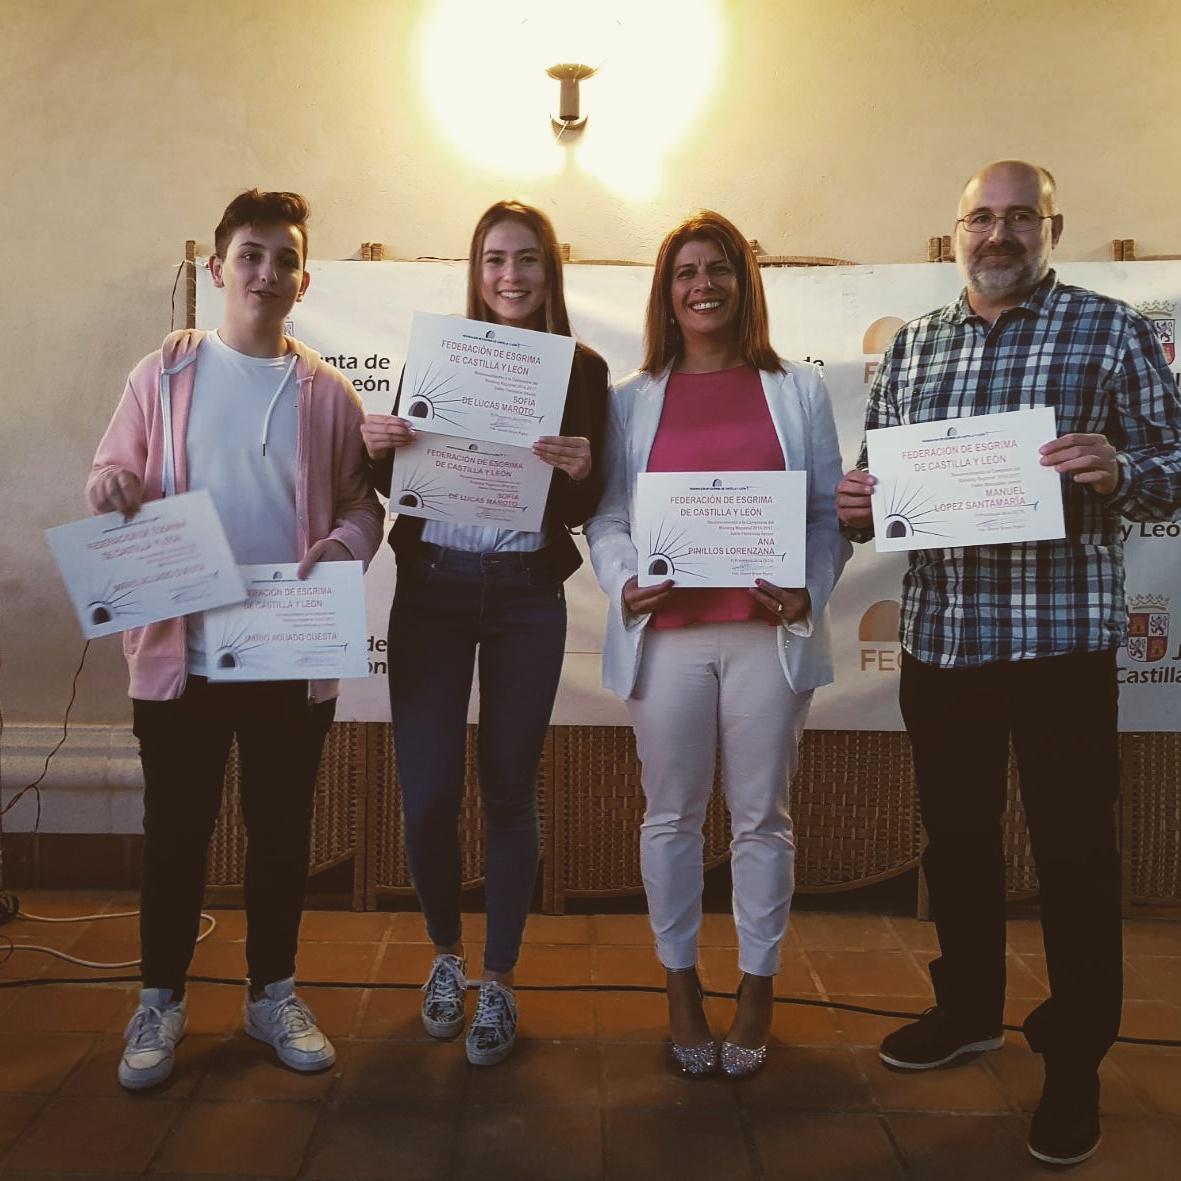 Crónica del Fin de Semana: Club de Esgrima de Segovia